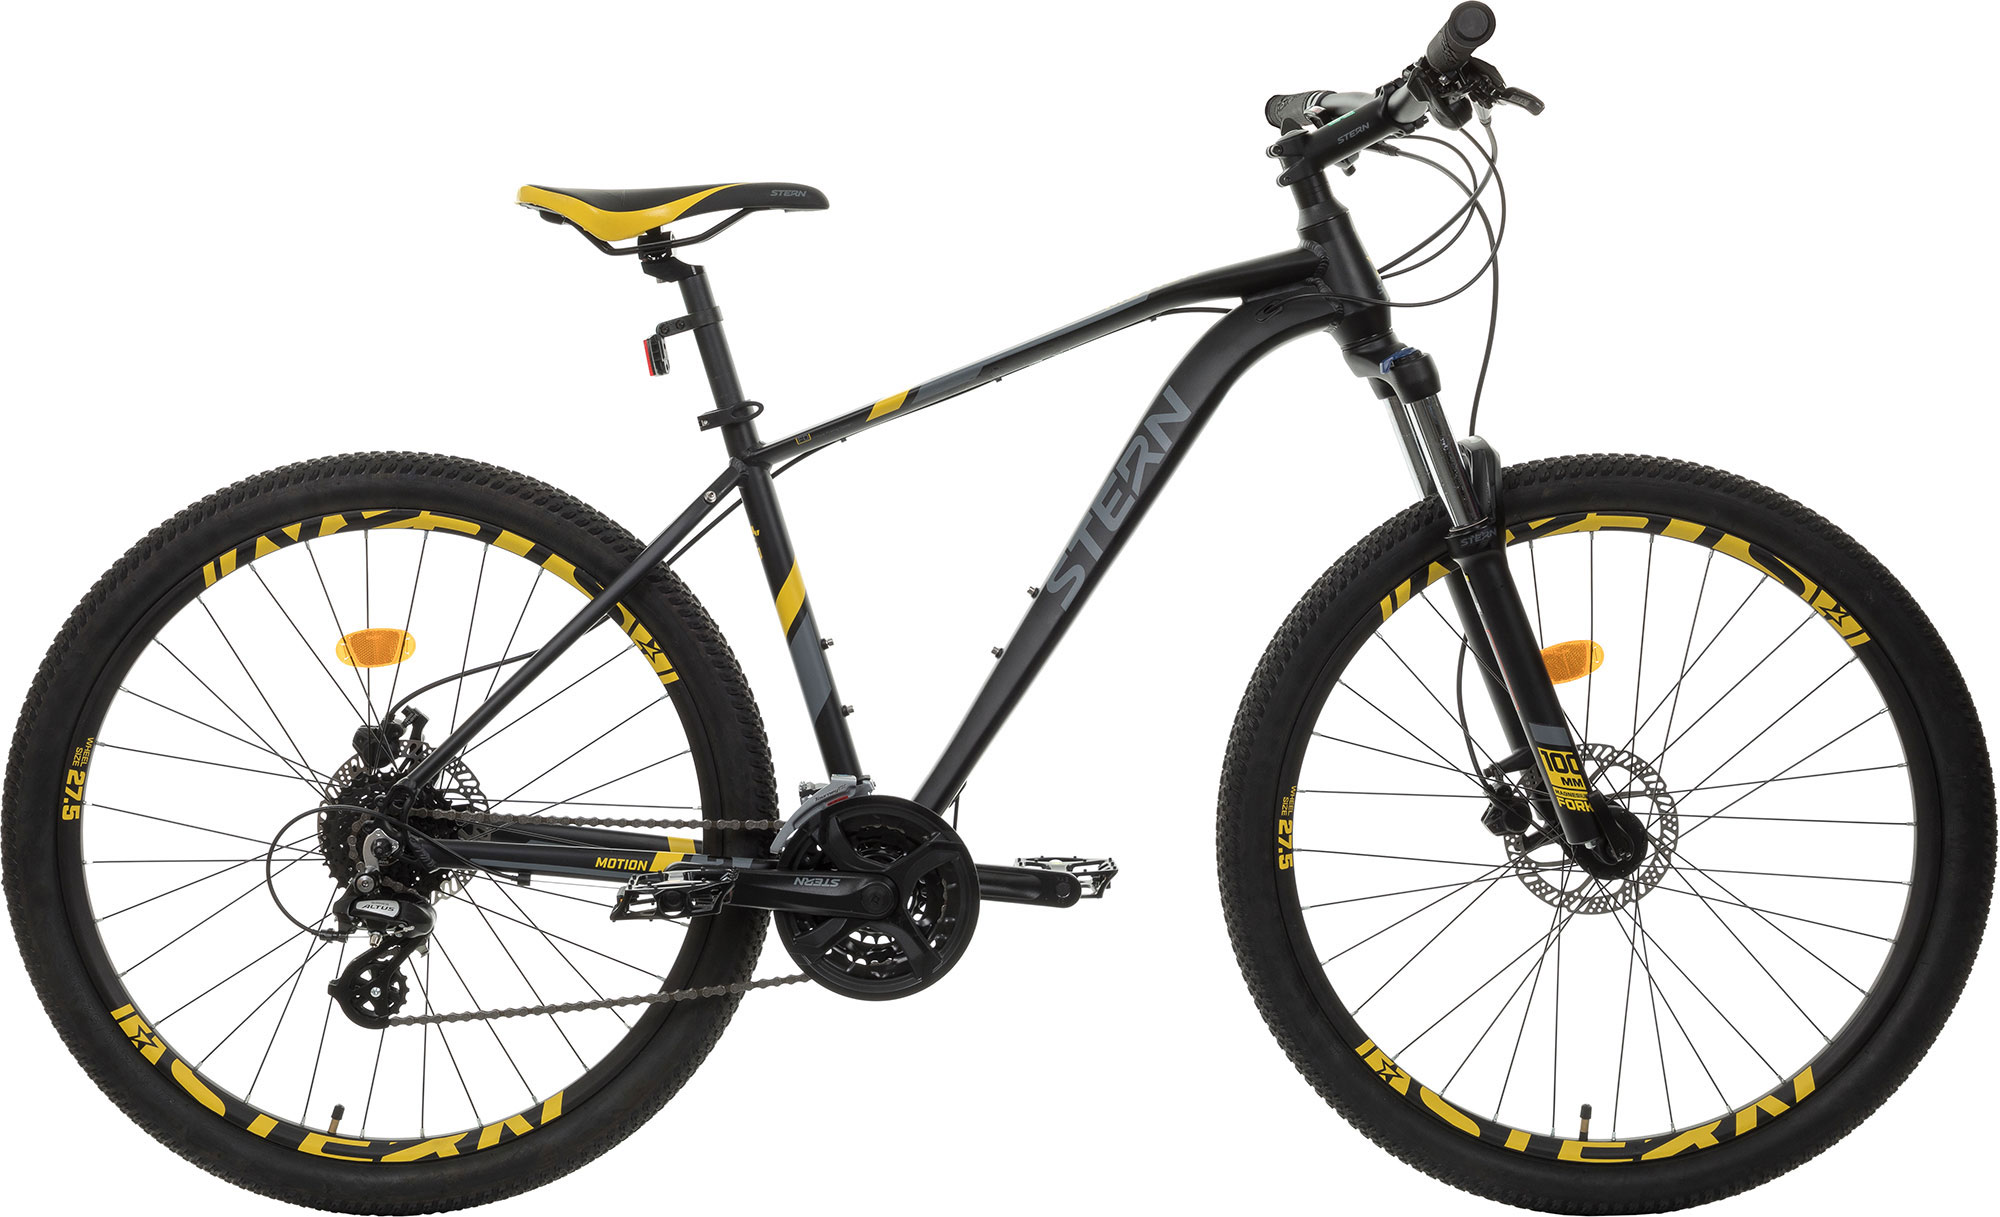 Stern Велосипед горный Stern Motion 2.0 27,5 stern stern motion 4 0 27 5 2018